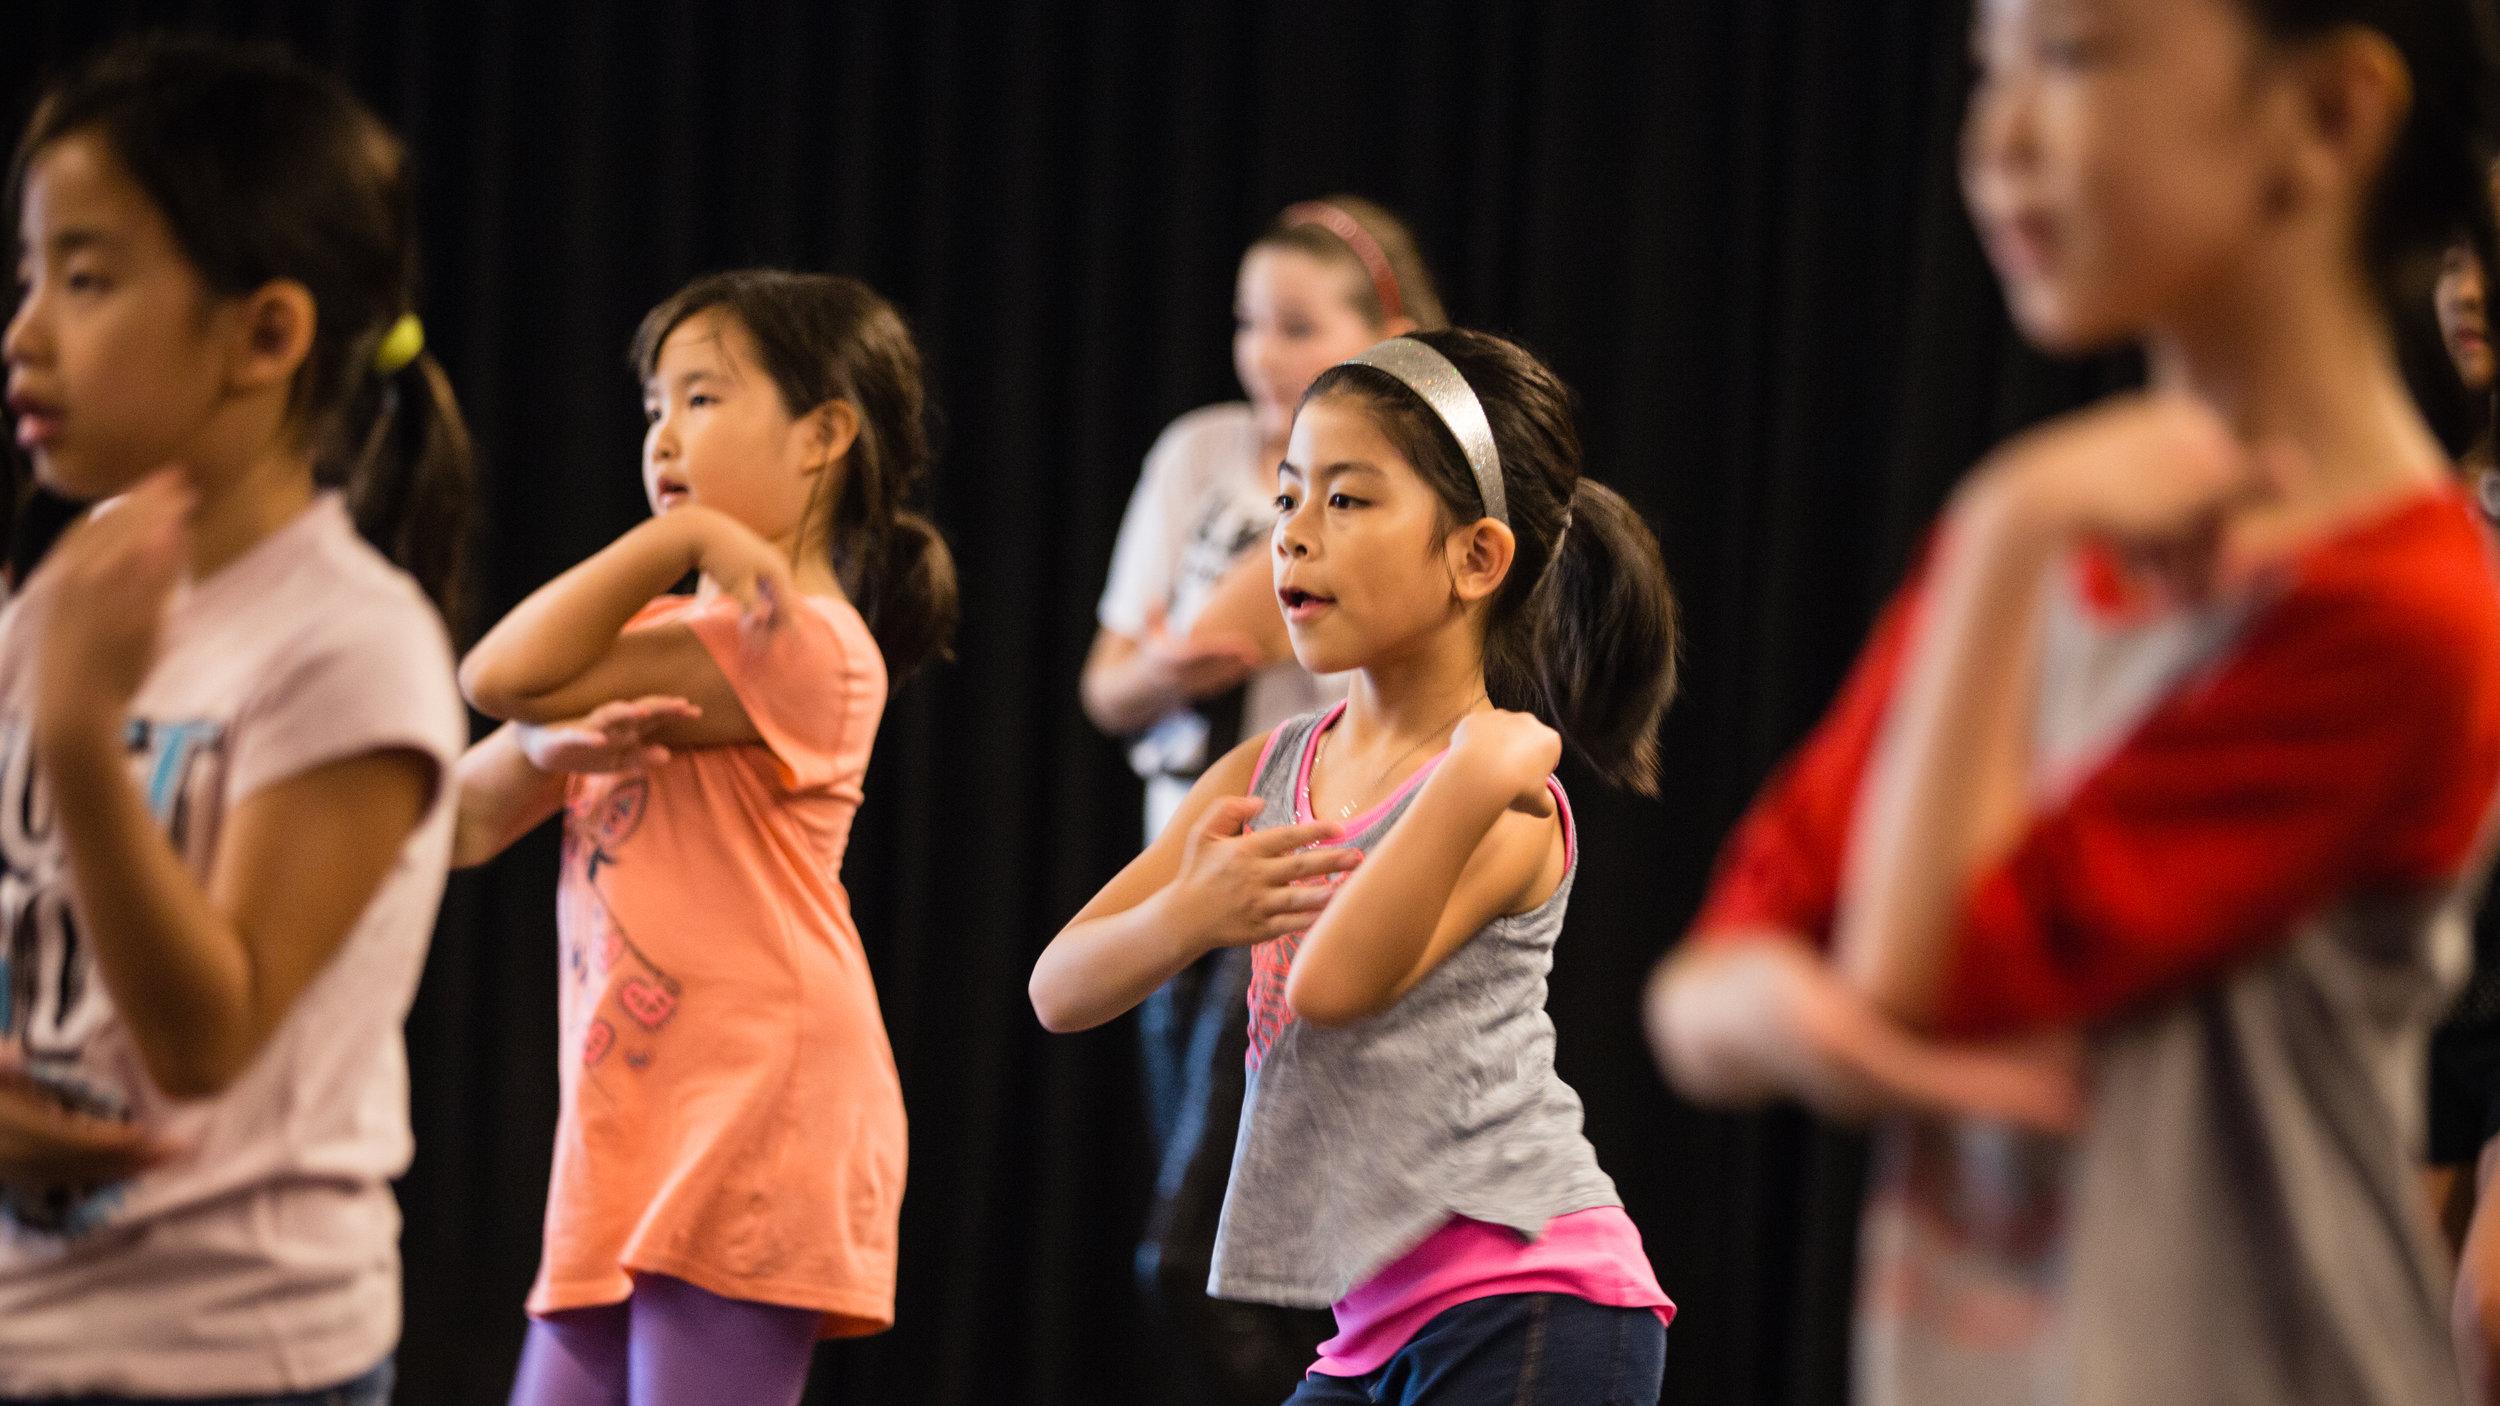 Singapore | O School Hip Hop Urban Dance Dance studio | Squarespace